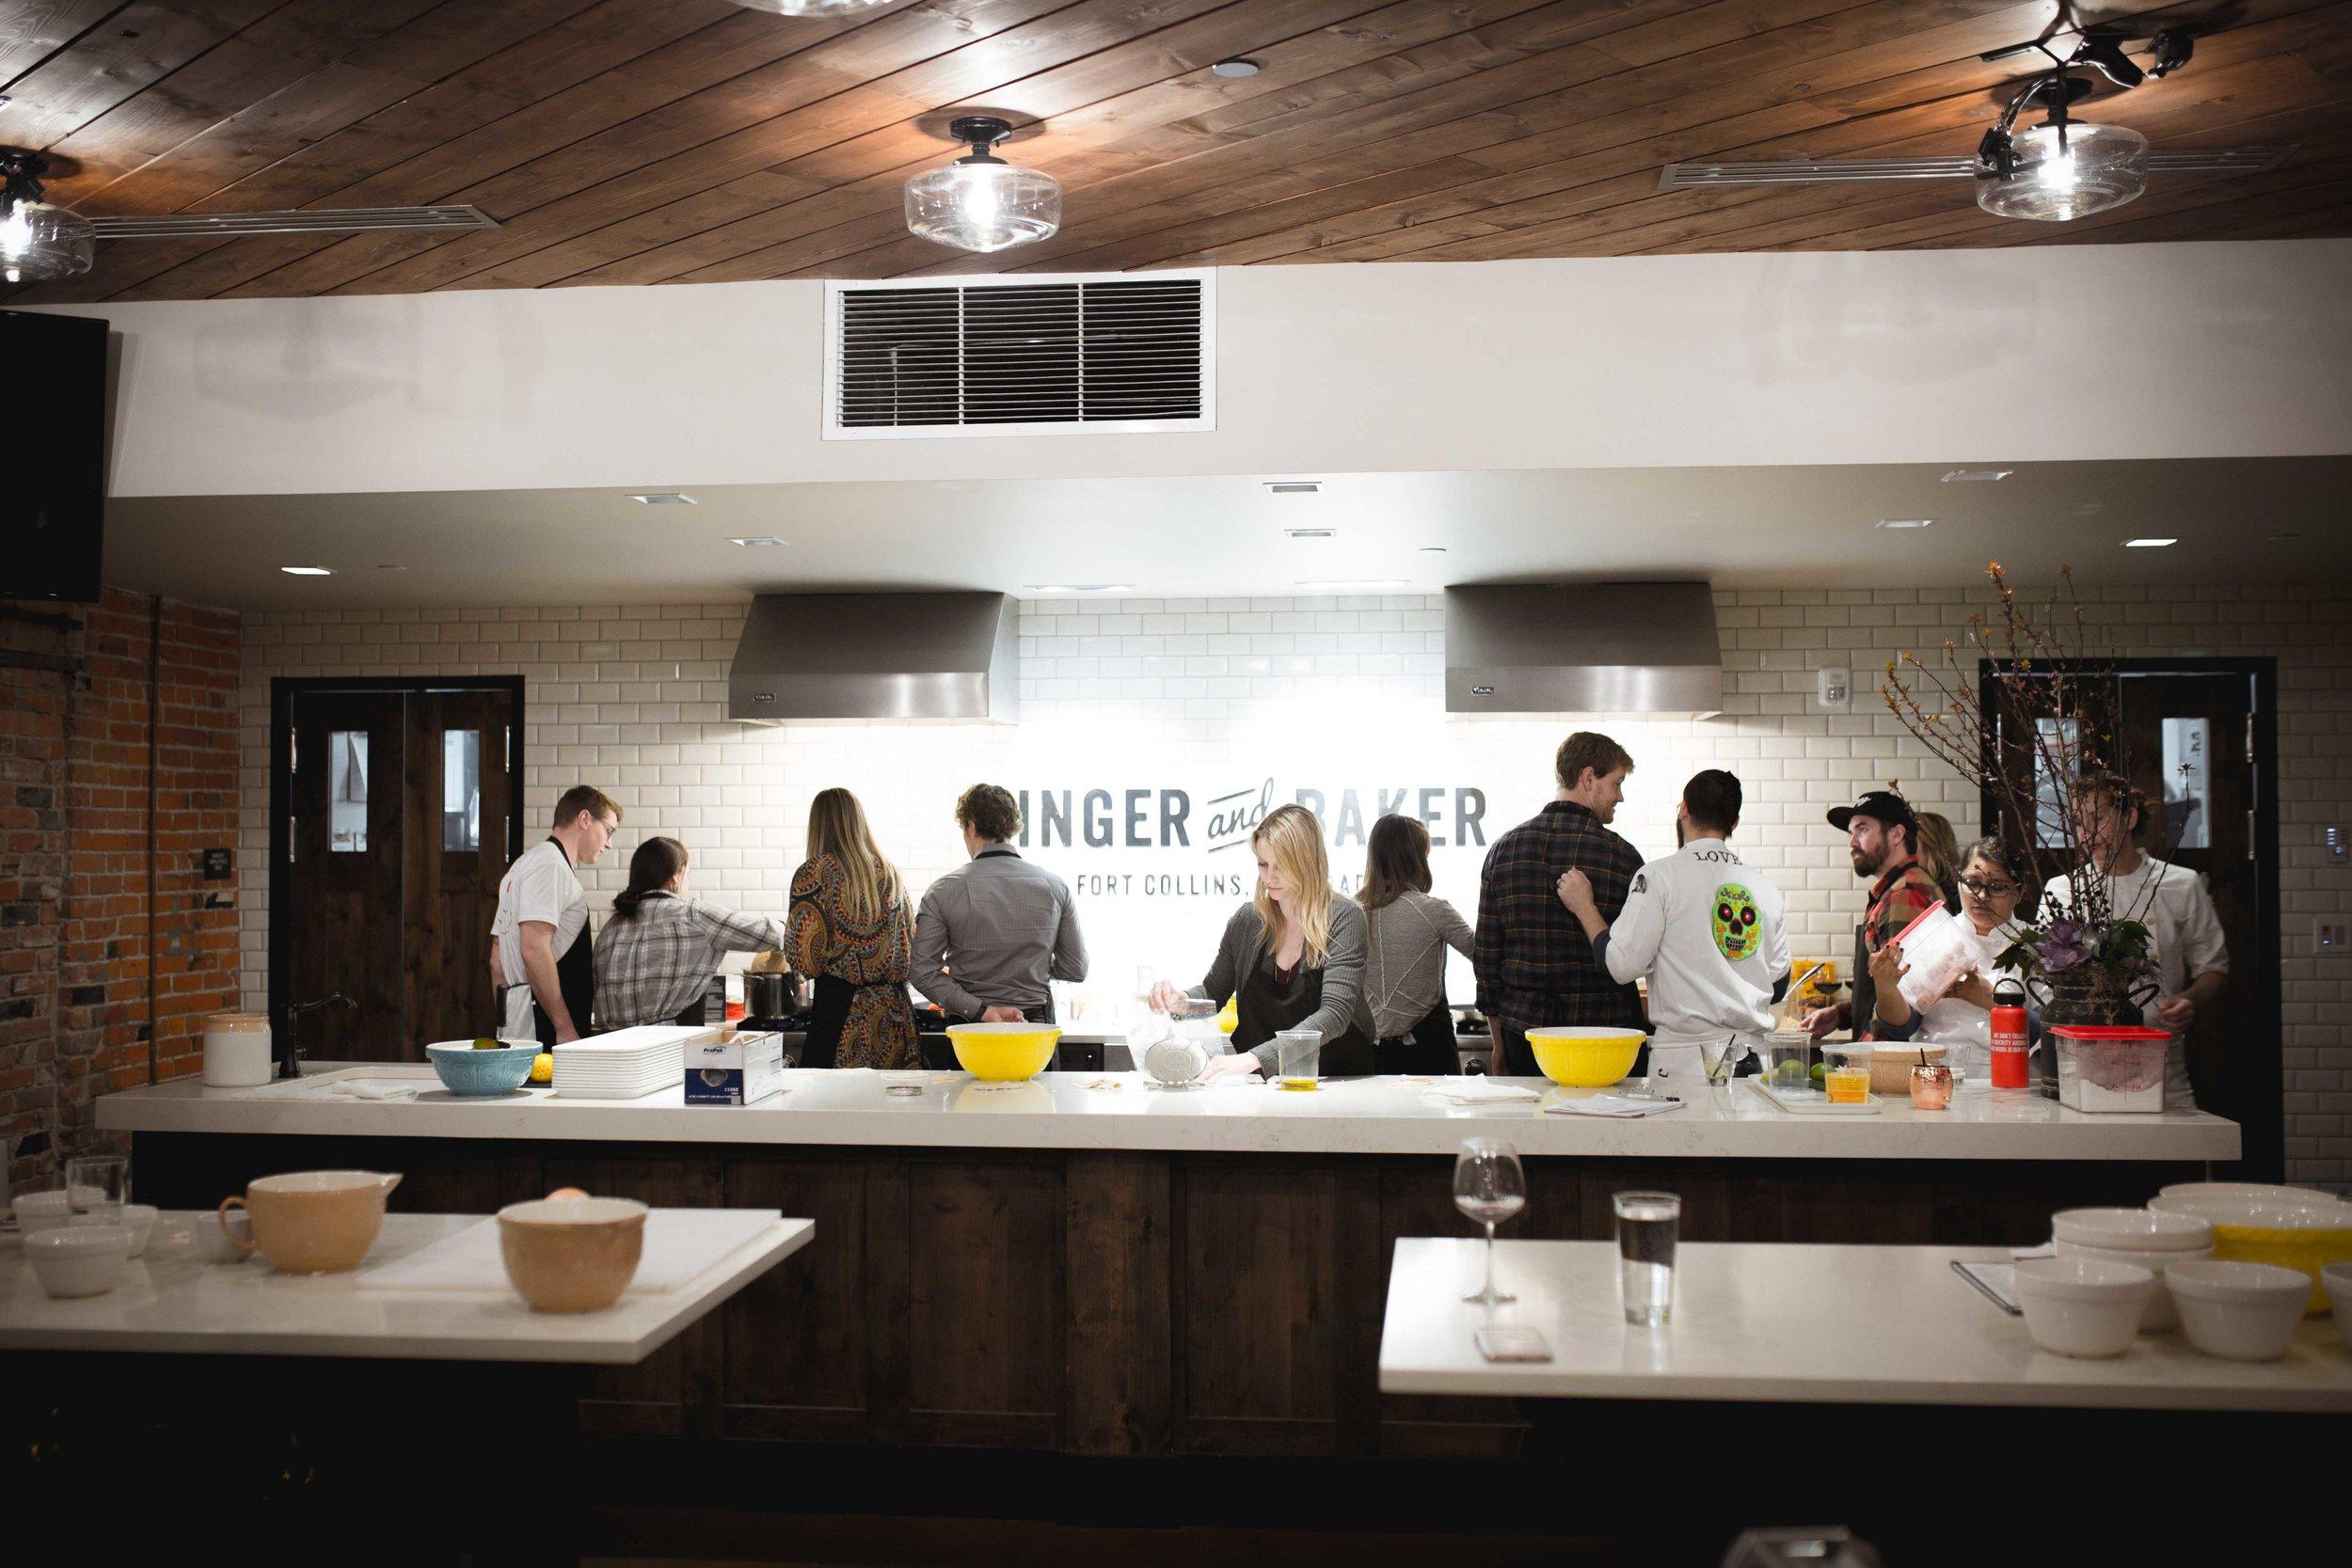 GingerandBaker-JuliyJuan-CookingClass-Feb28-52.jpg